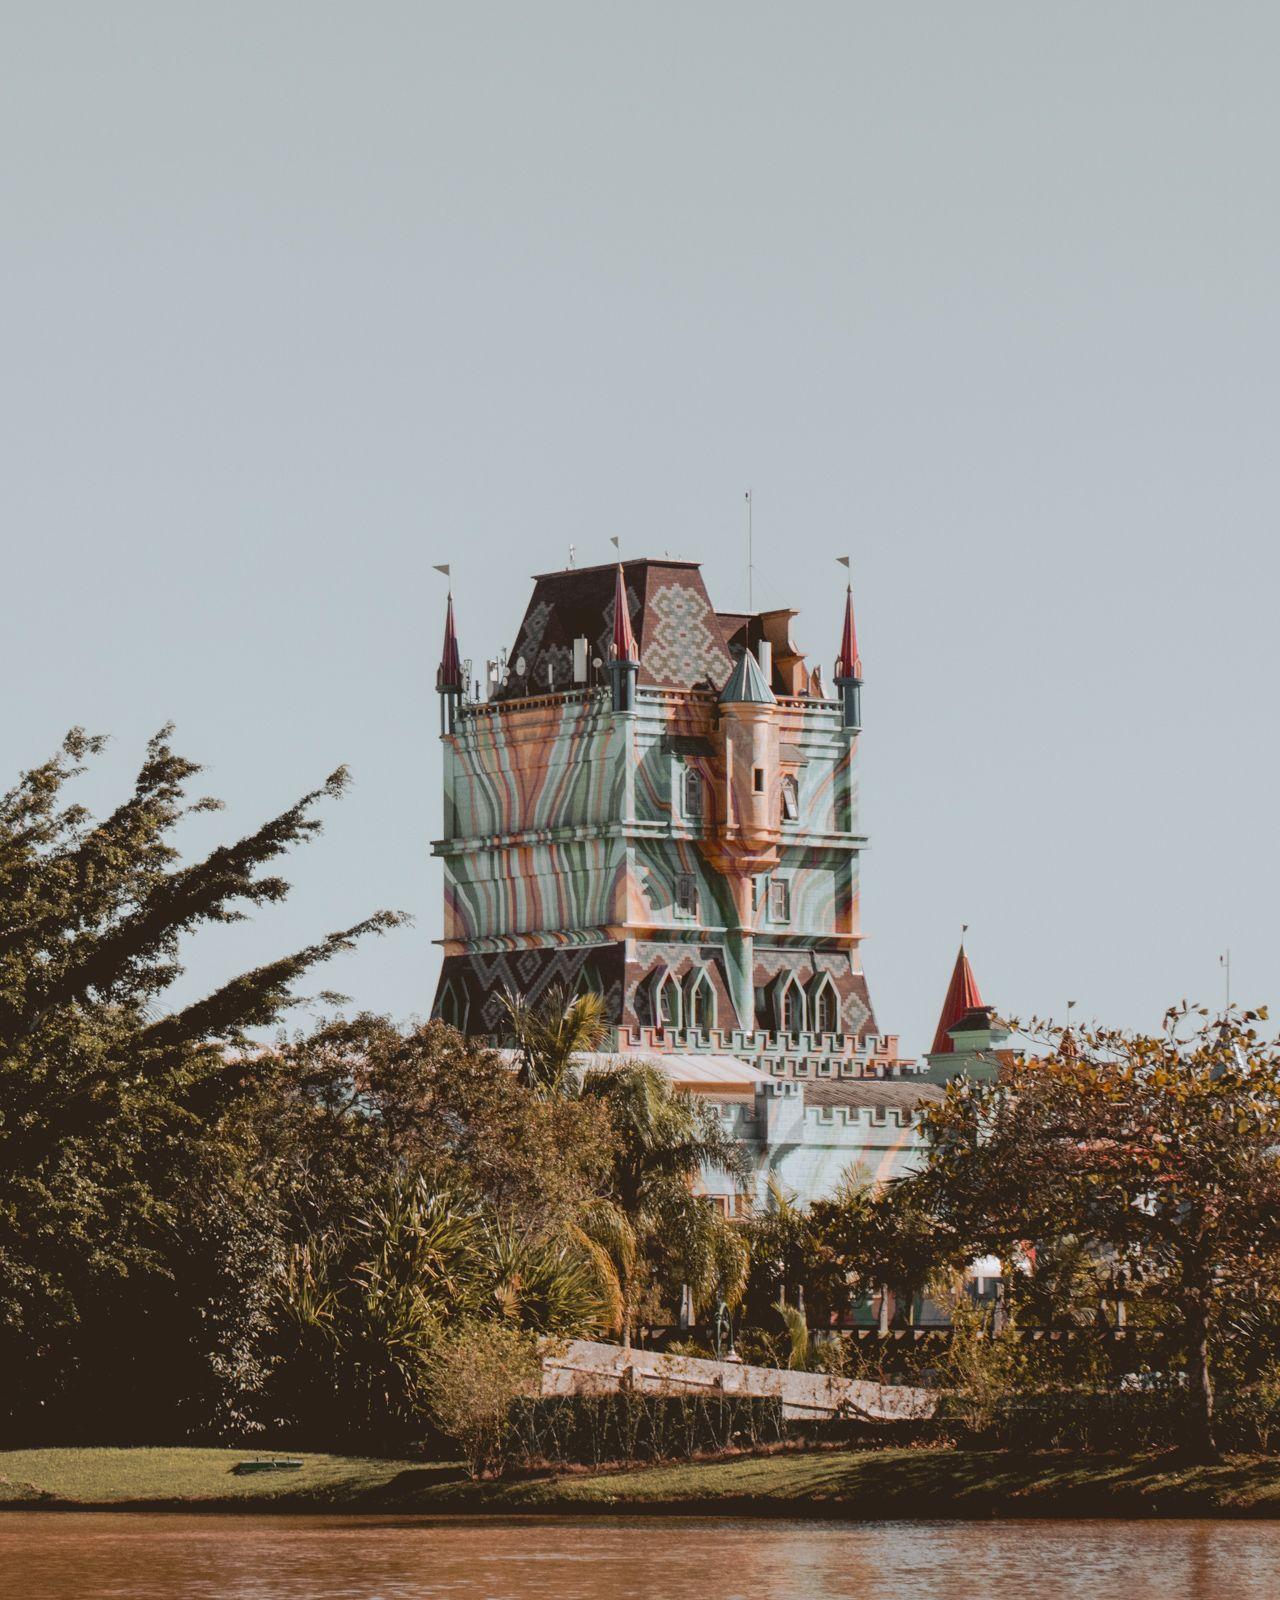 castelo parque beto carrero world